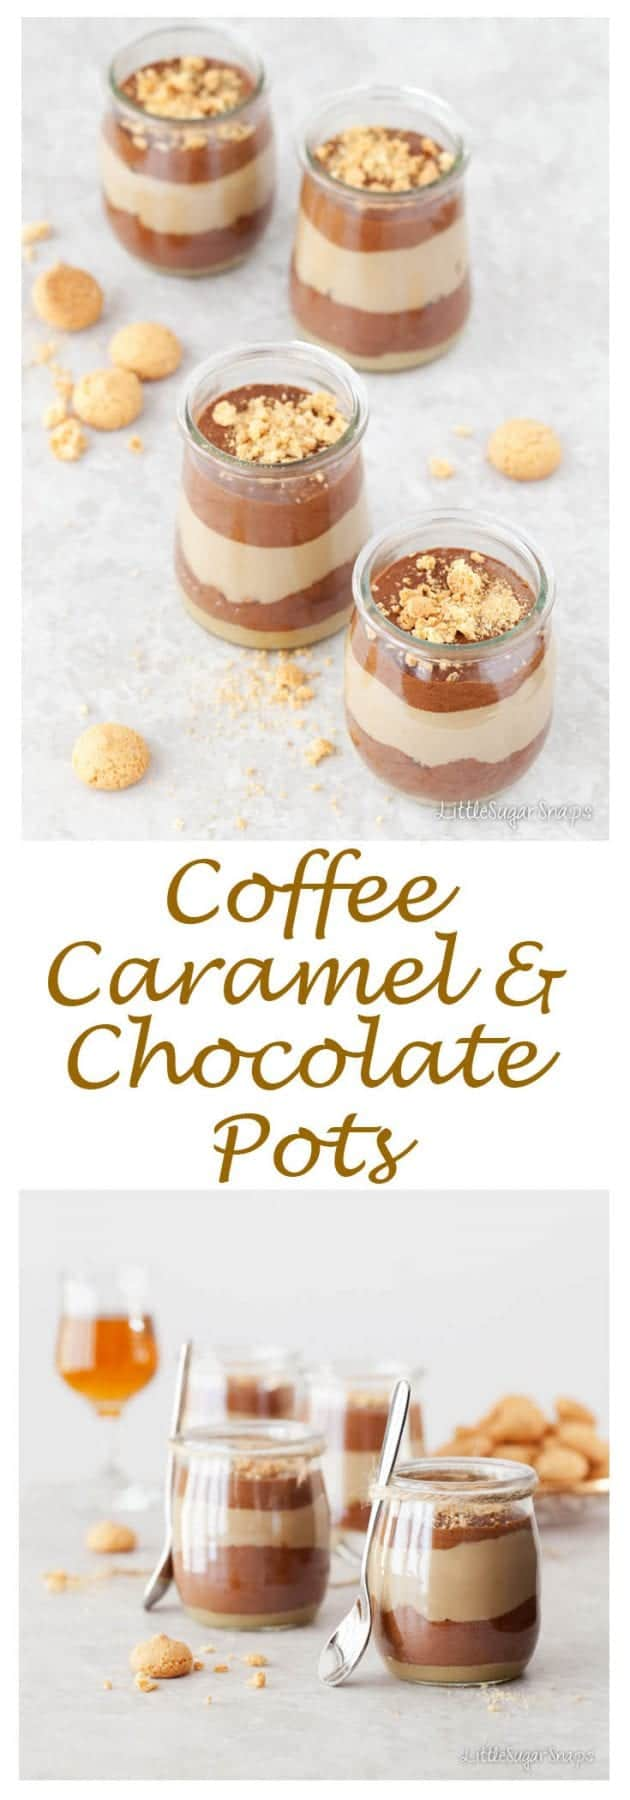 Triple Layer Coffee Caramel Chocolate Pots blends creamy coffee custard with luscious caramel, light chocolate mousse & crushed Amaretti. Irresistible.